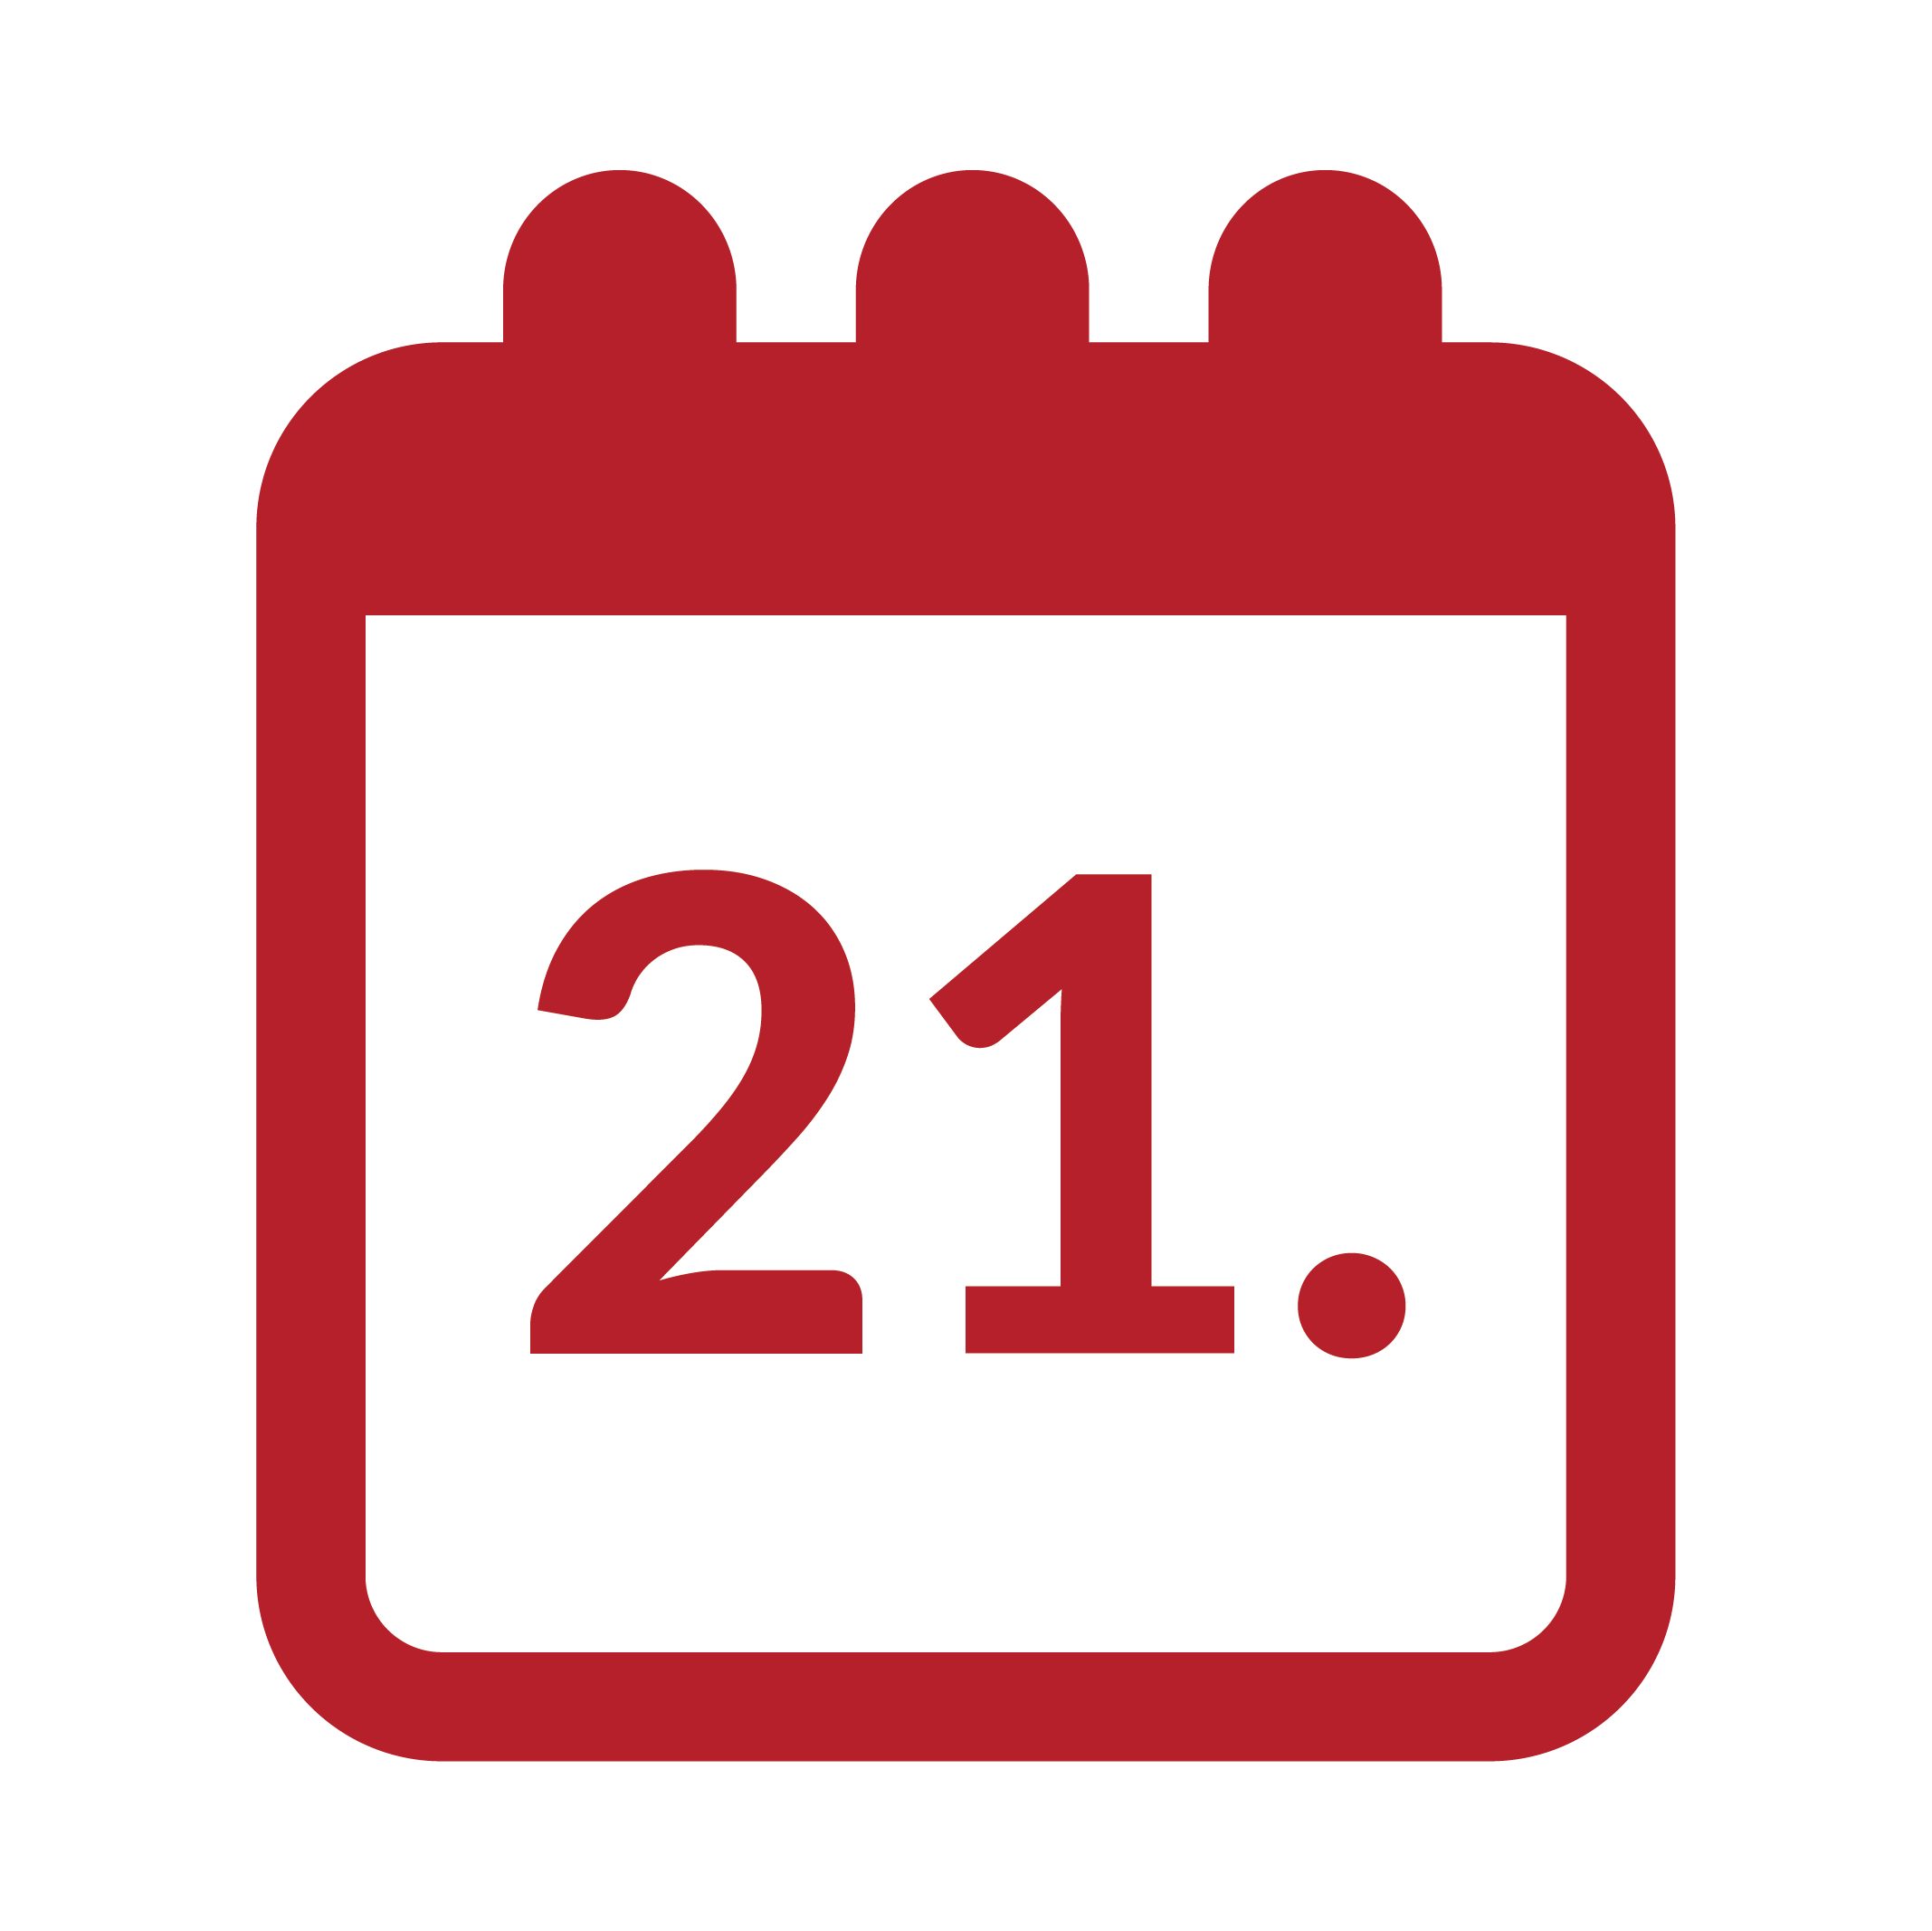 neues-in-hohenkreuz-kalender-21-01